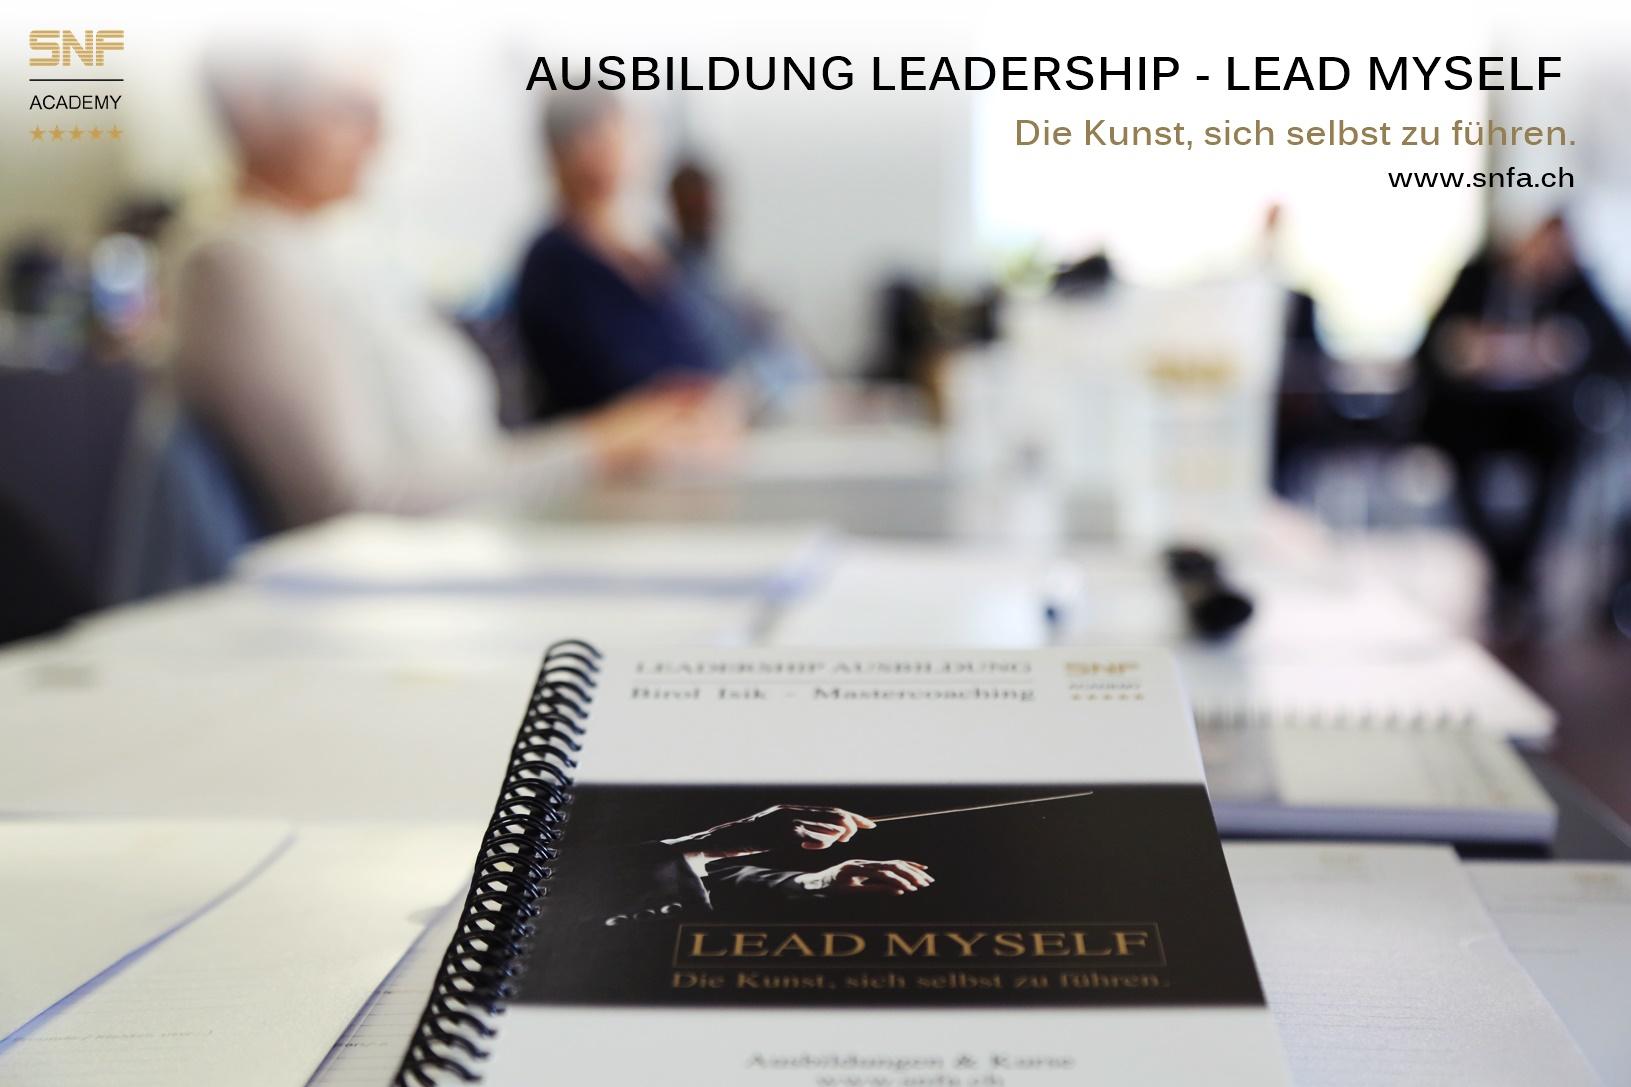 Ausbildung Leadership